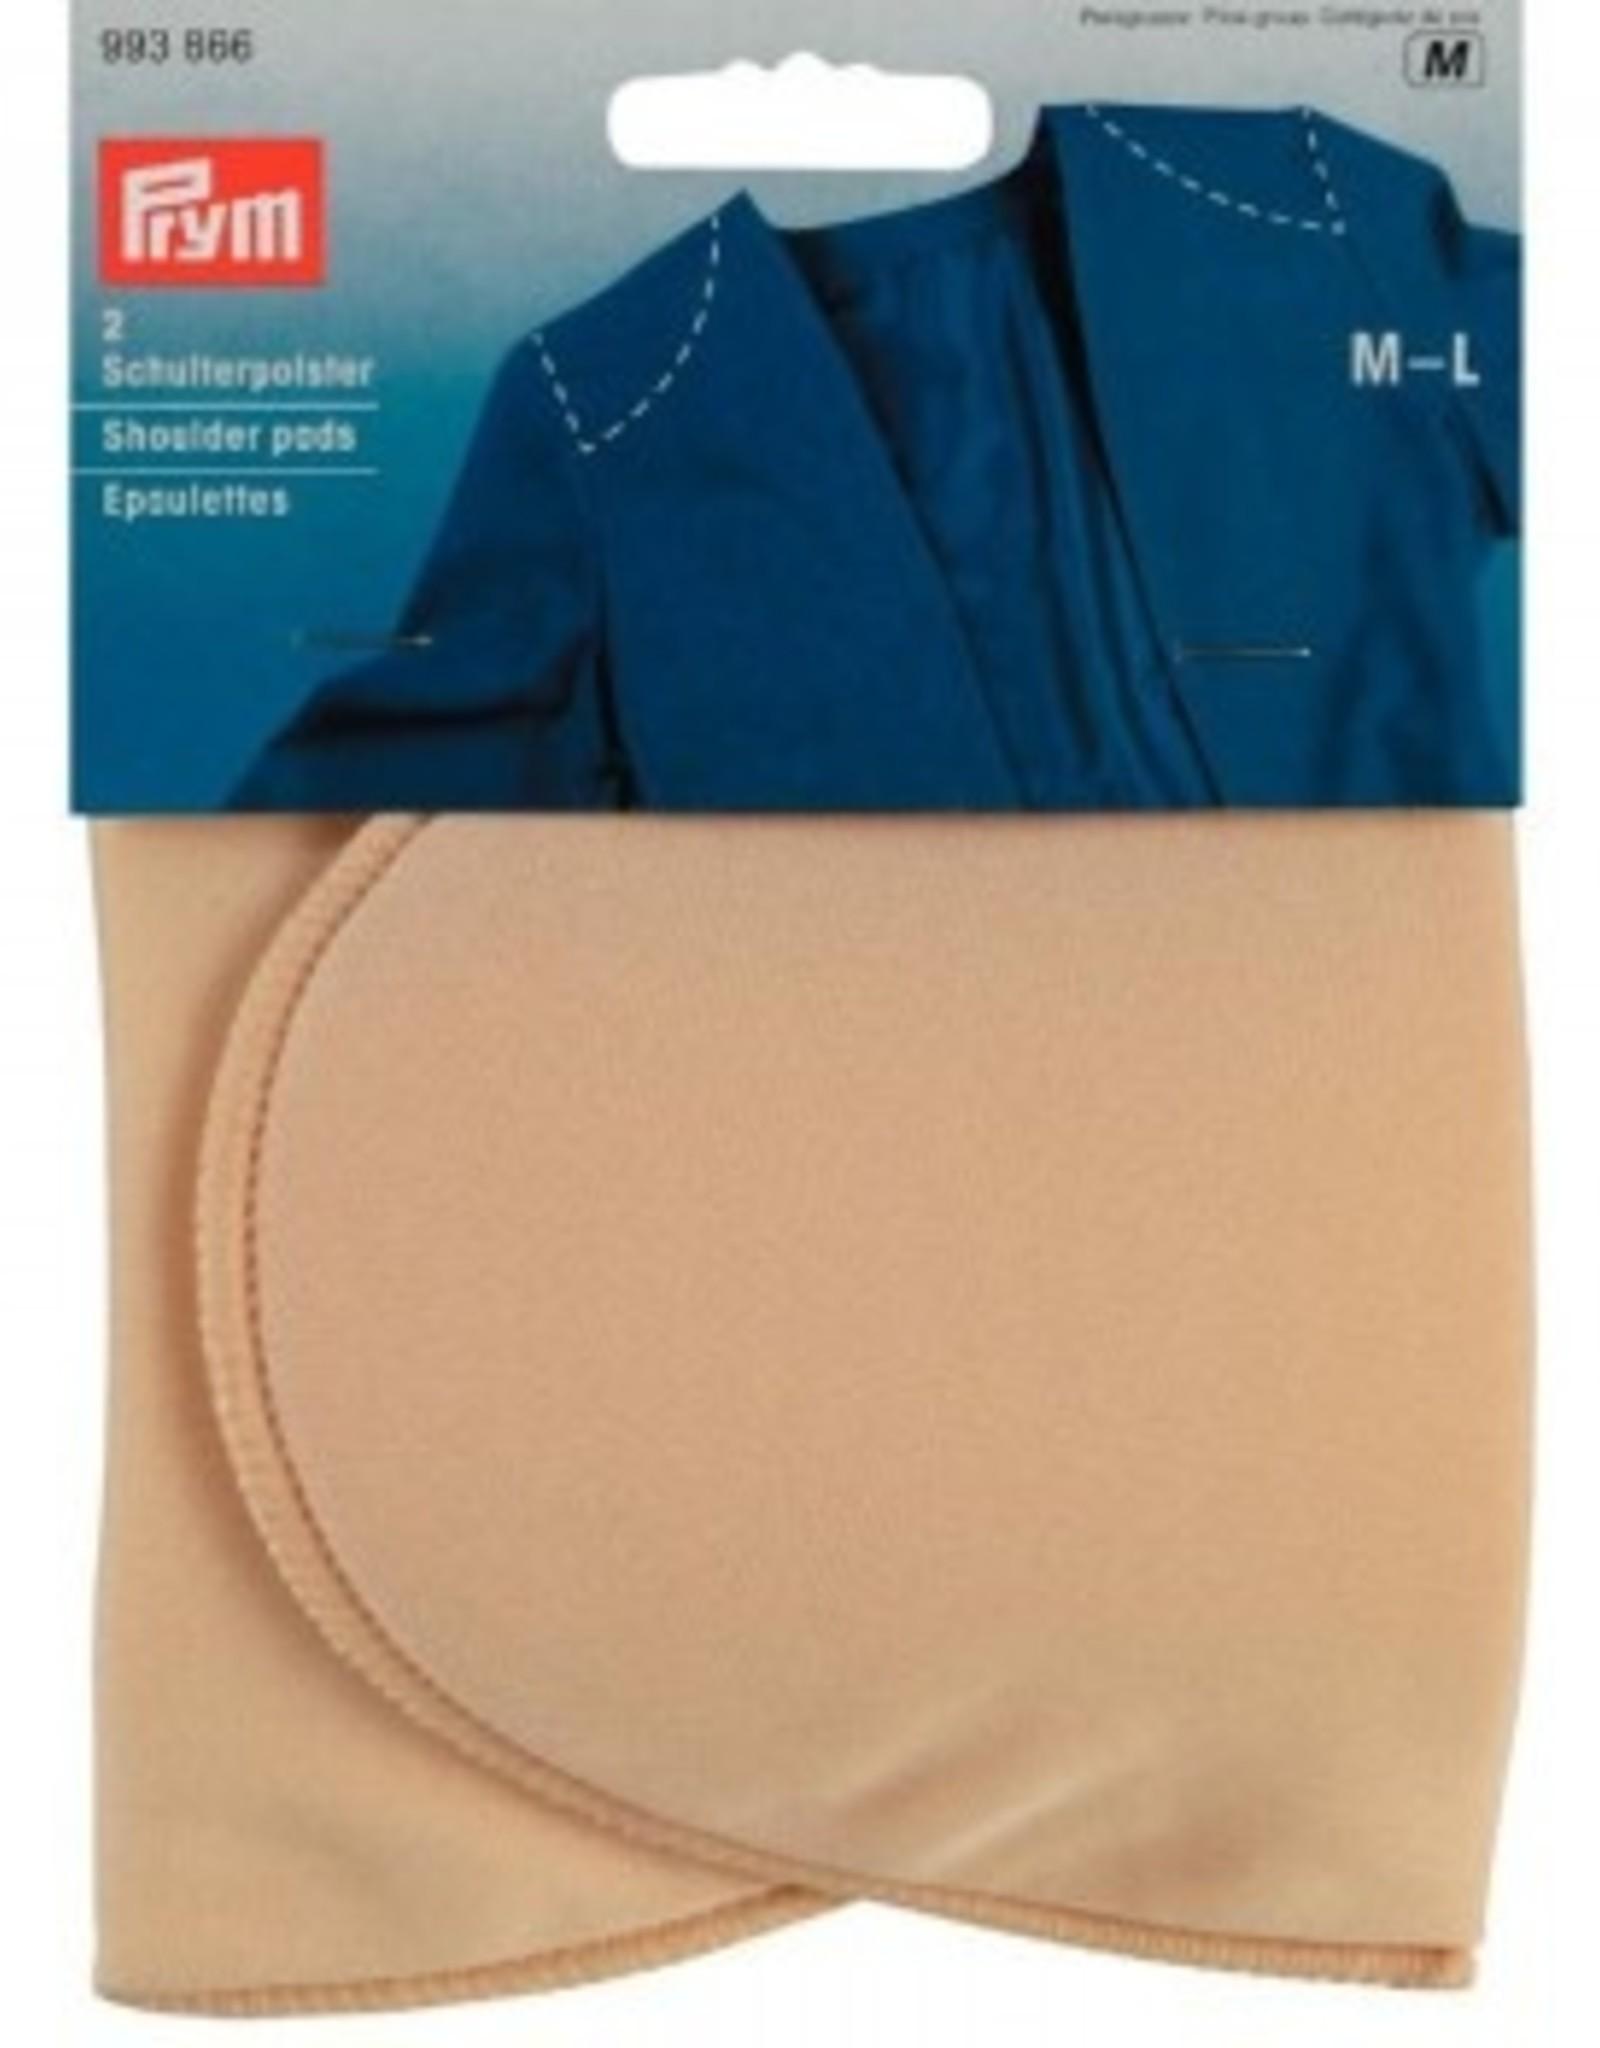 Prym Prym -  schoudervullingen M-L huidskleur - 993 886